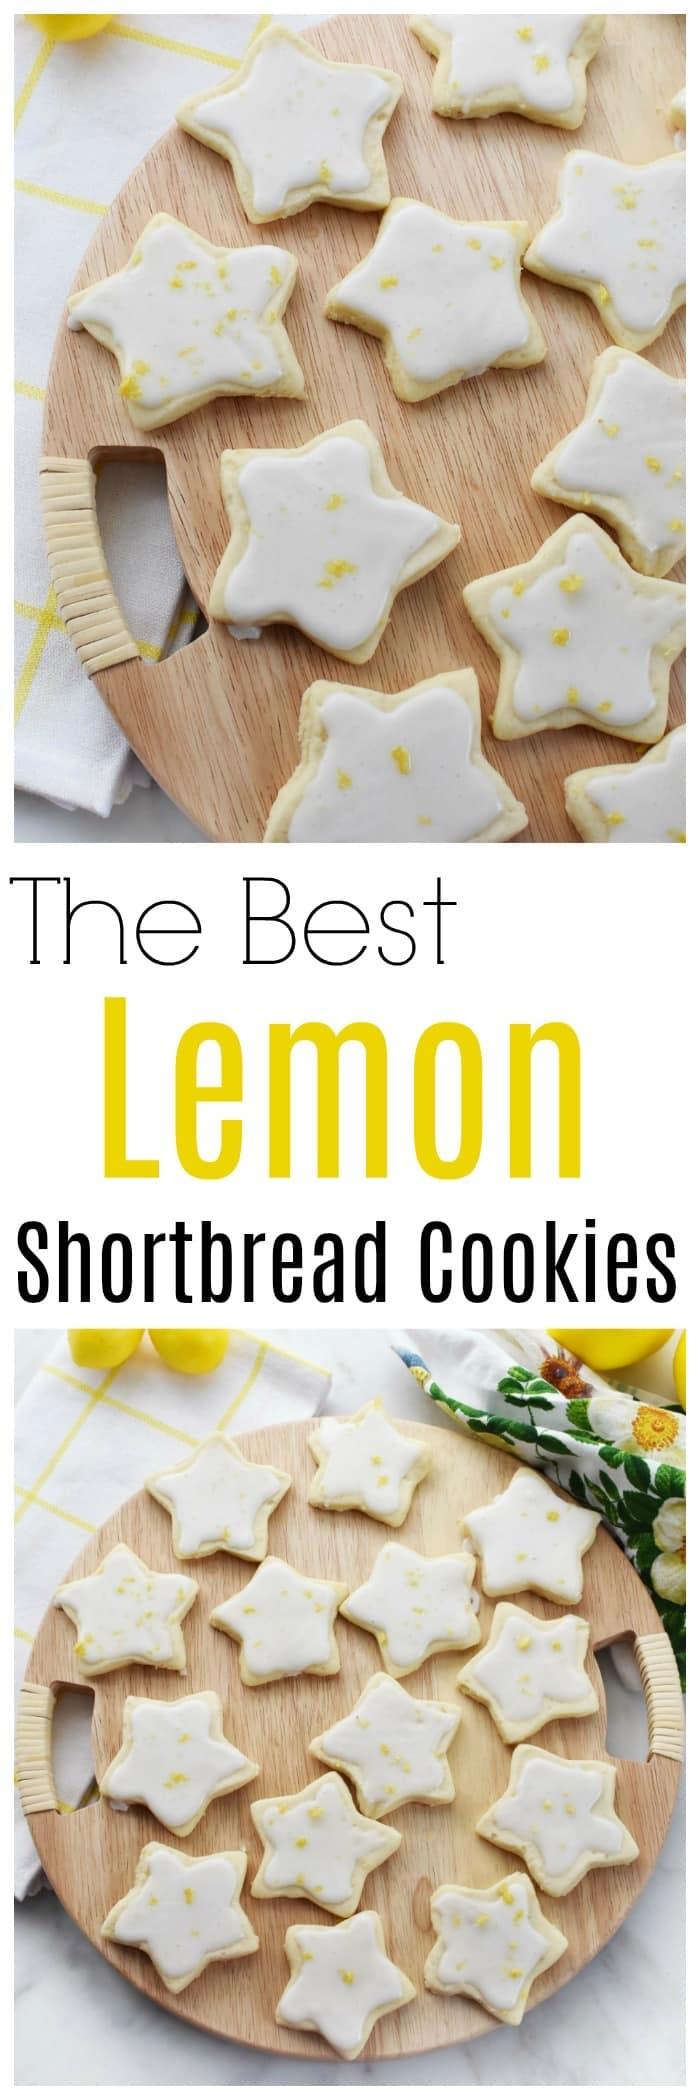 The Best Lemon Shortbread Cookies